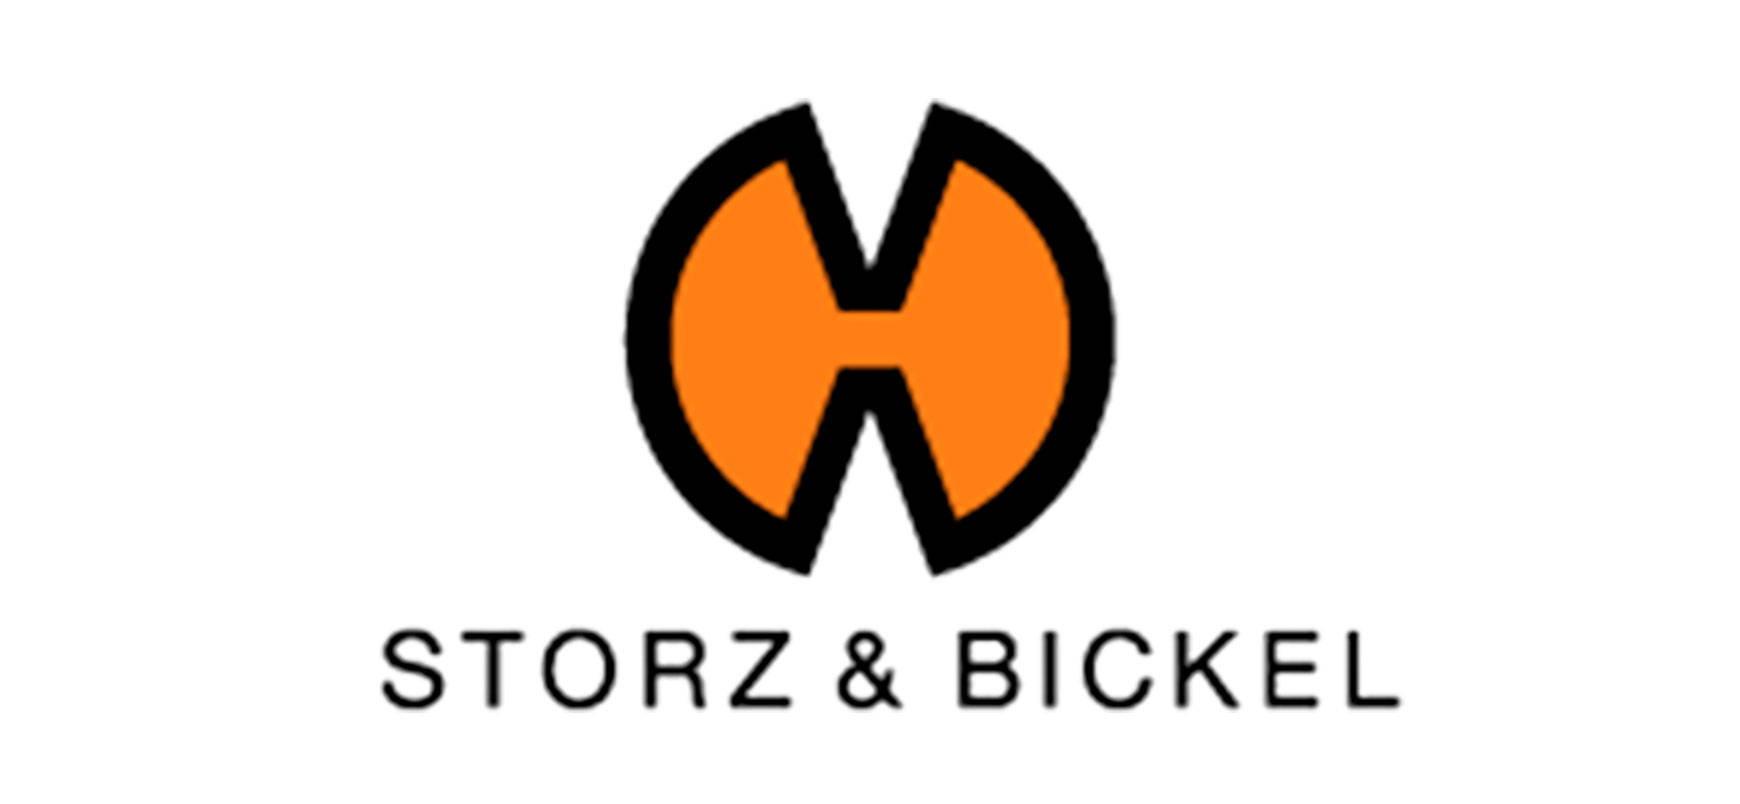 Storz & Bickel Vaporizers at DopeBoo.com